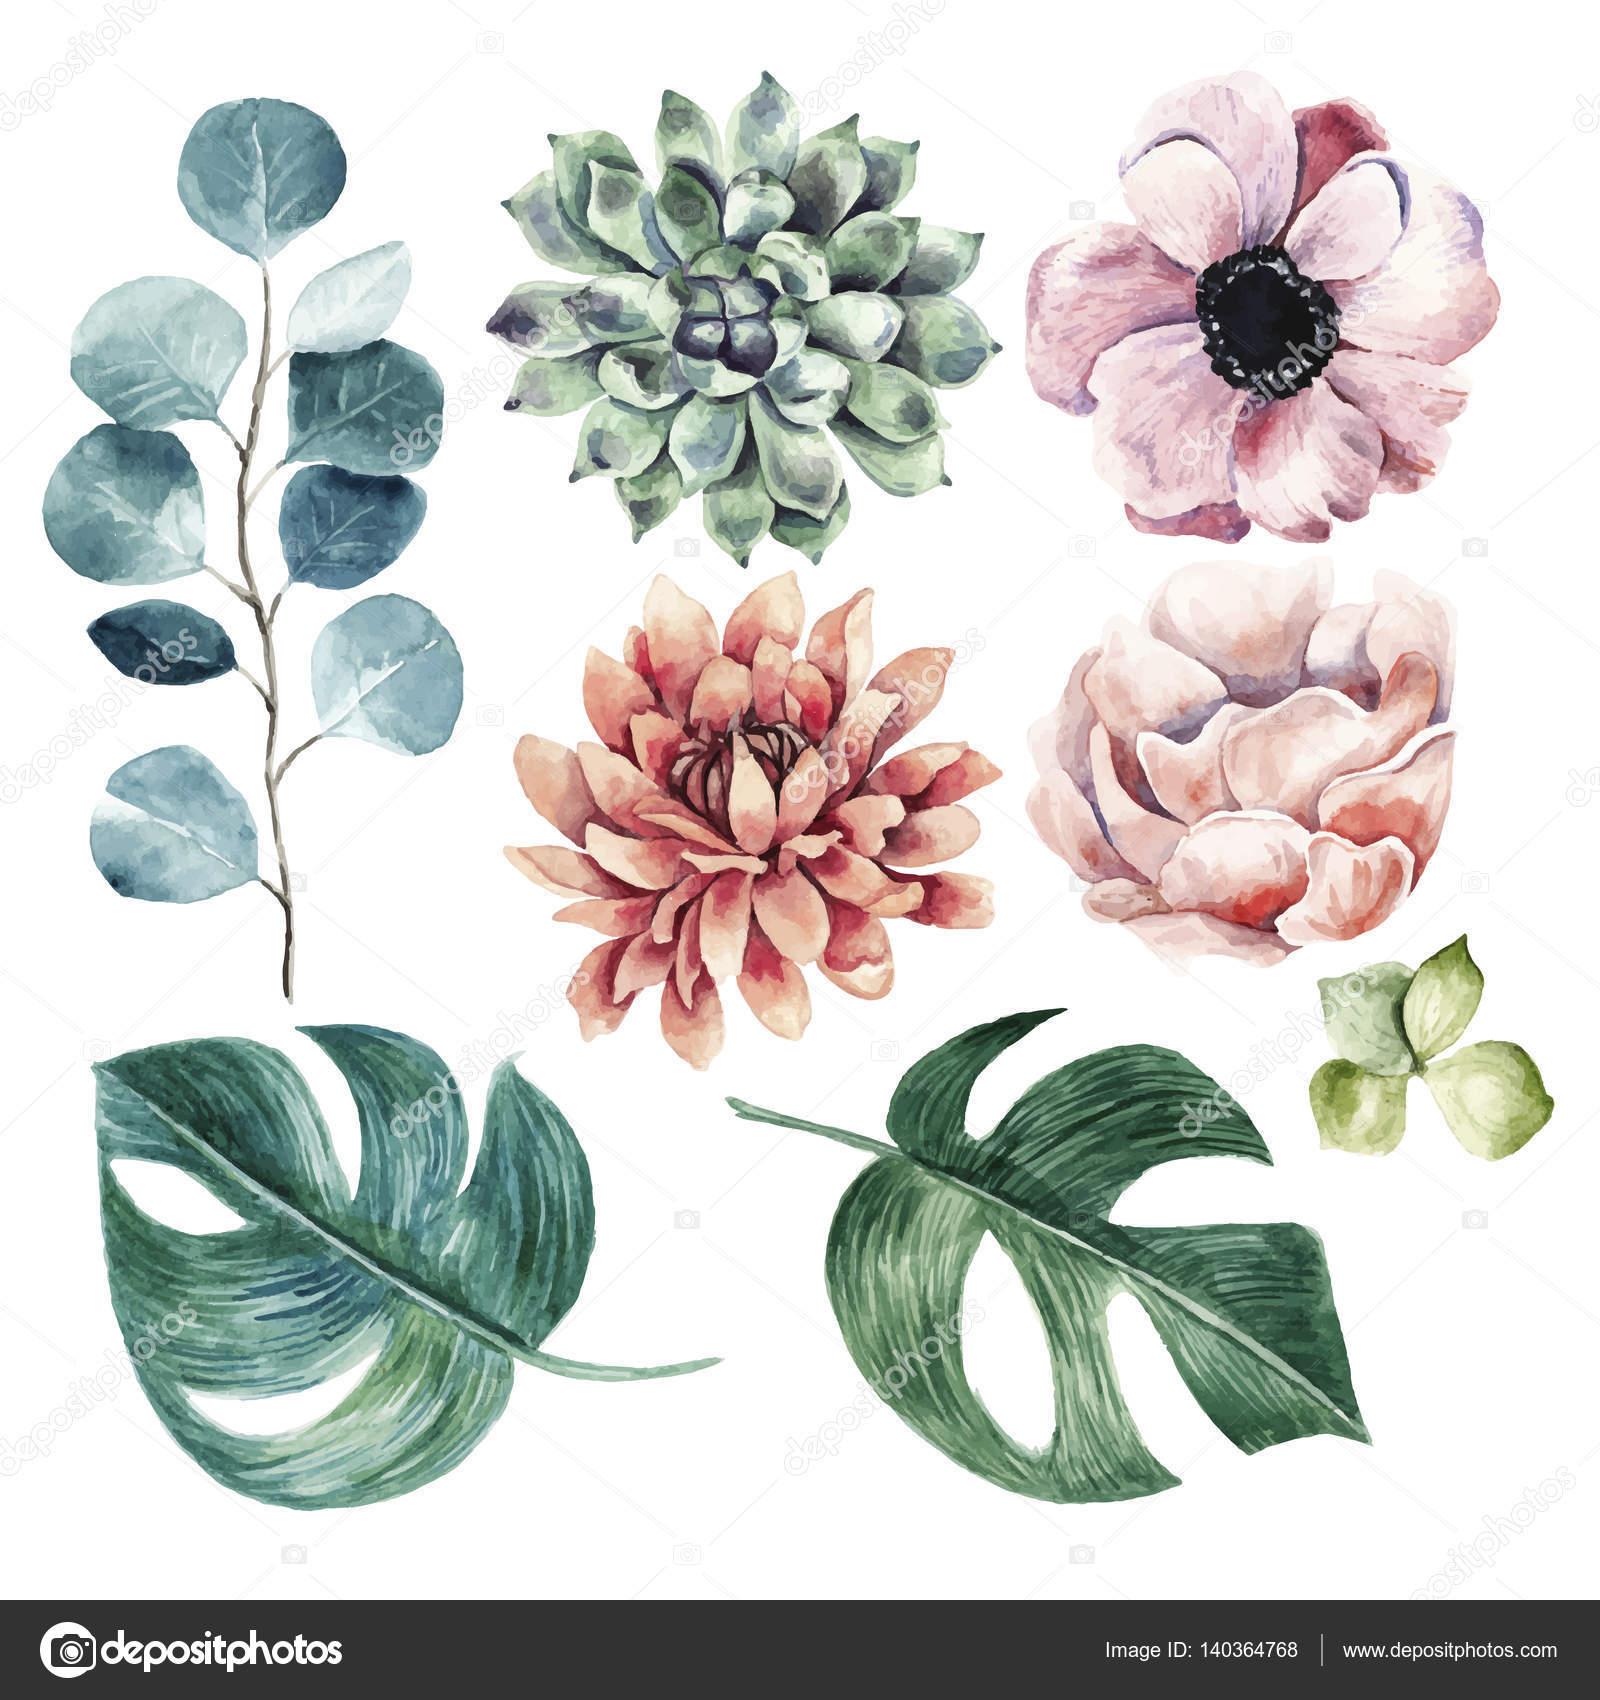 Petal clipart big flower Flower Watercolor collection illustration #140364768